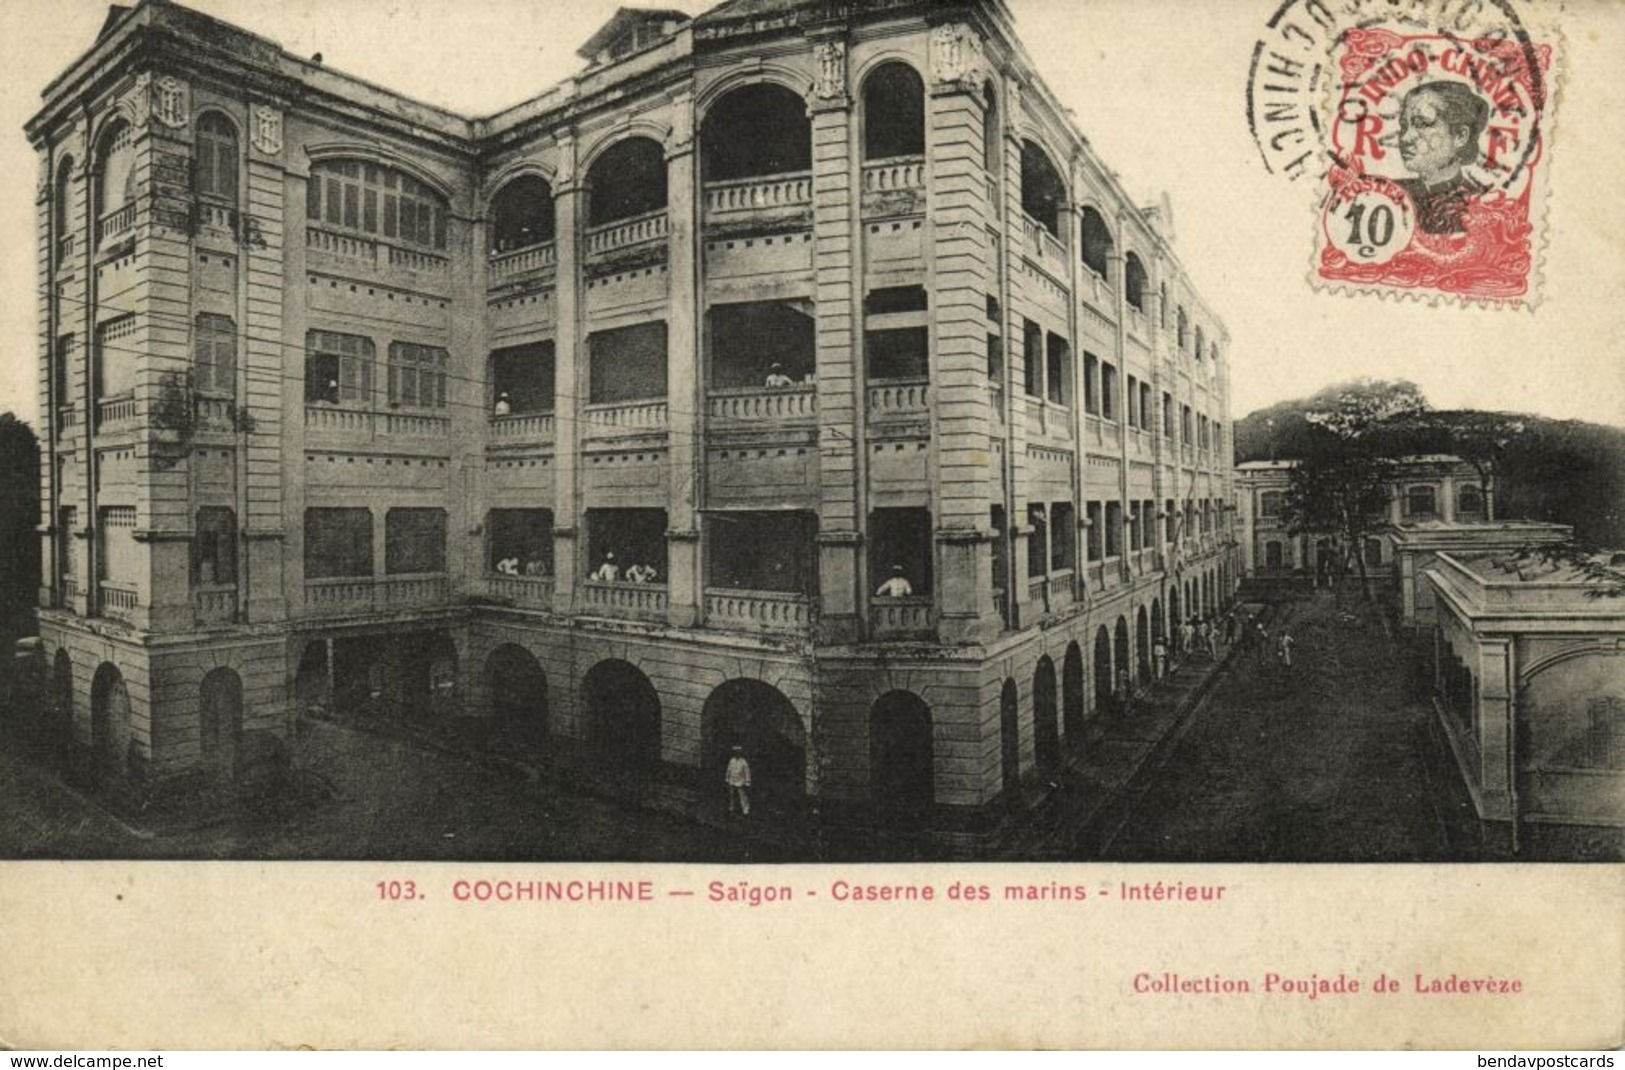 Indochina, SAIGON, Caserne Des Marins, Intérieur, Marine Barracks 1910 Postcard - Viêt-Nam